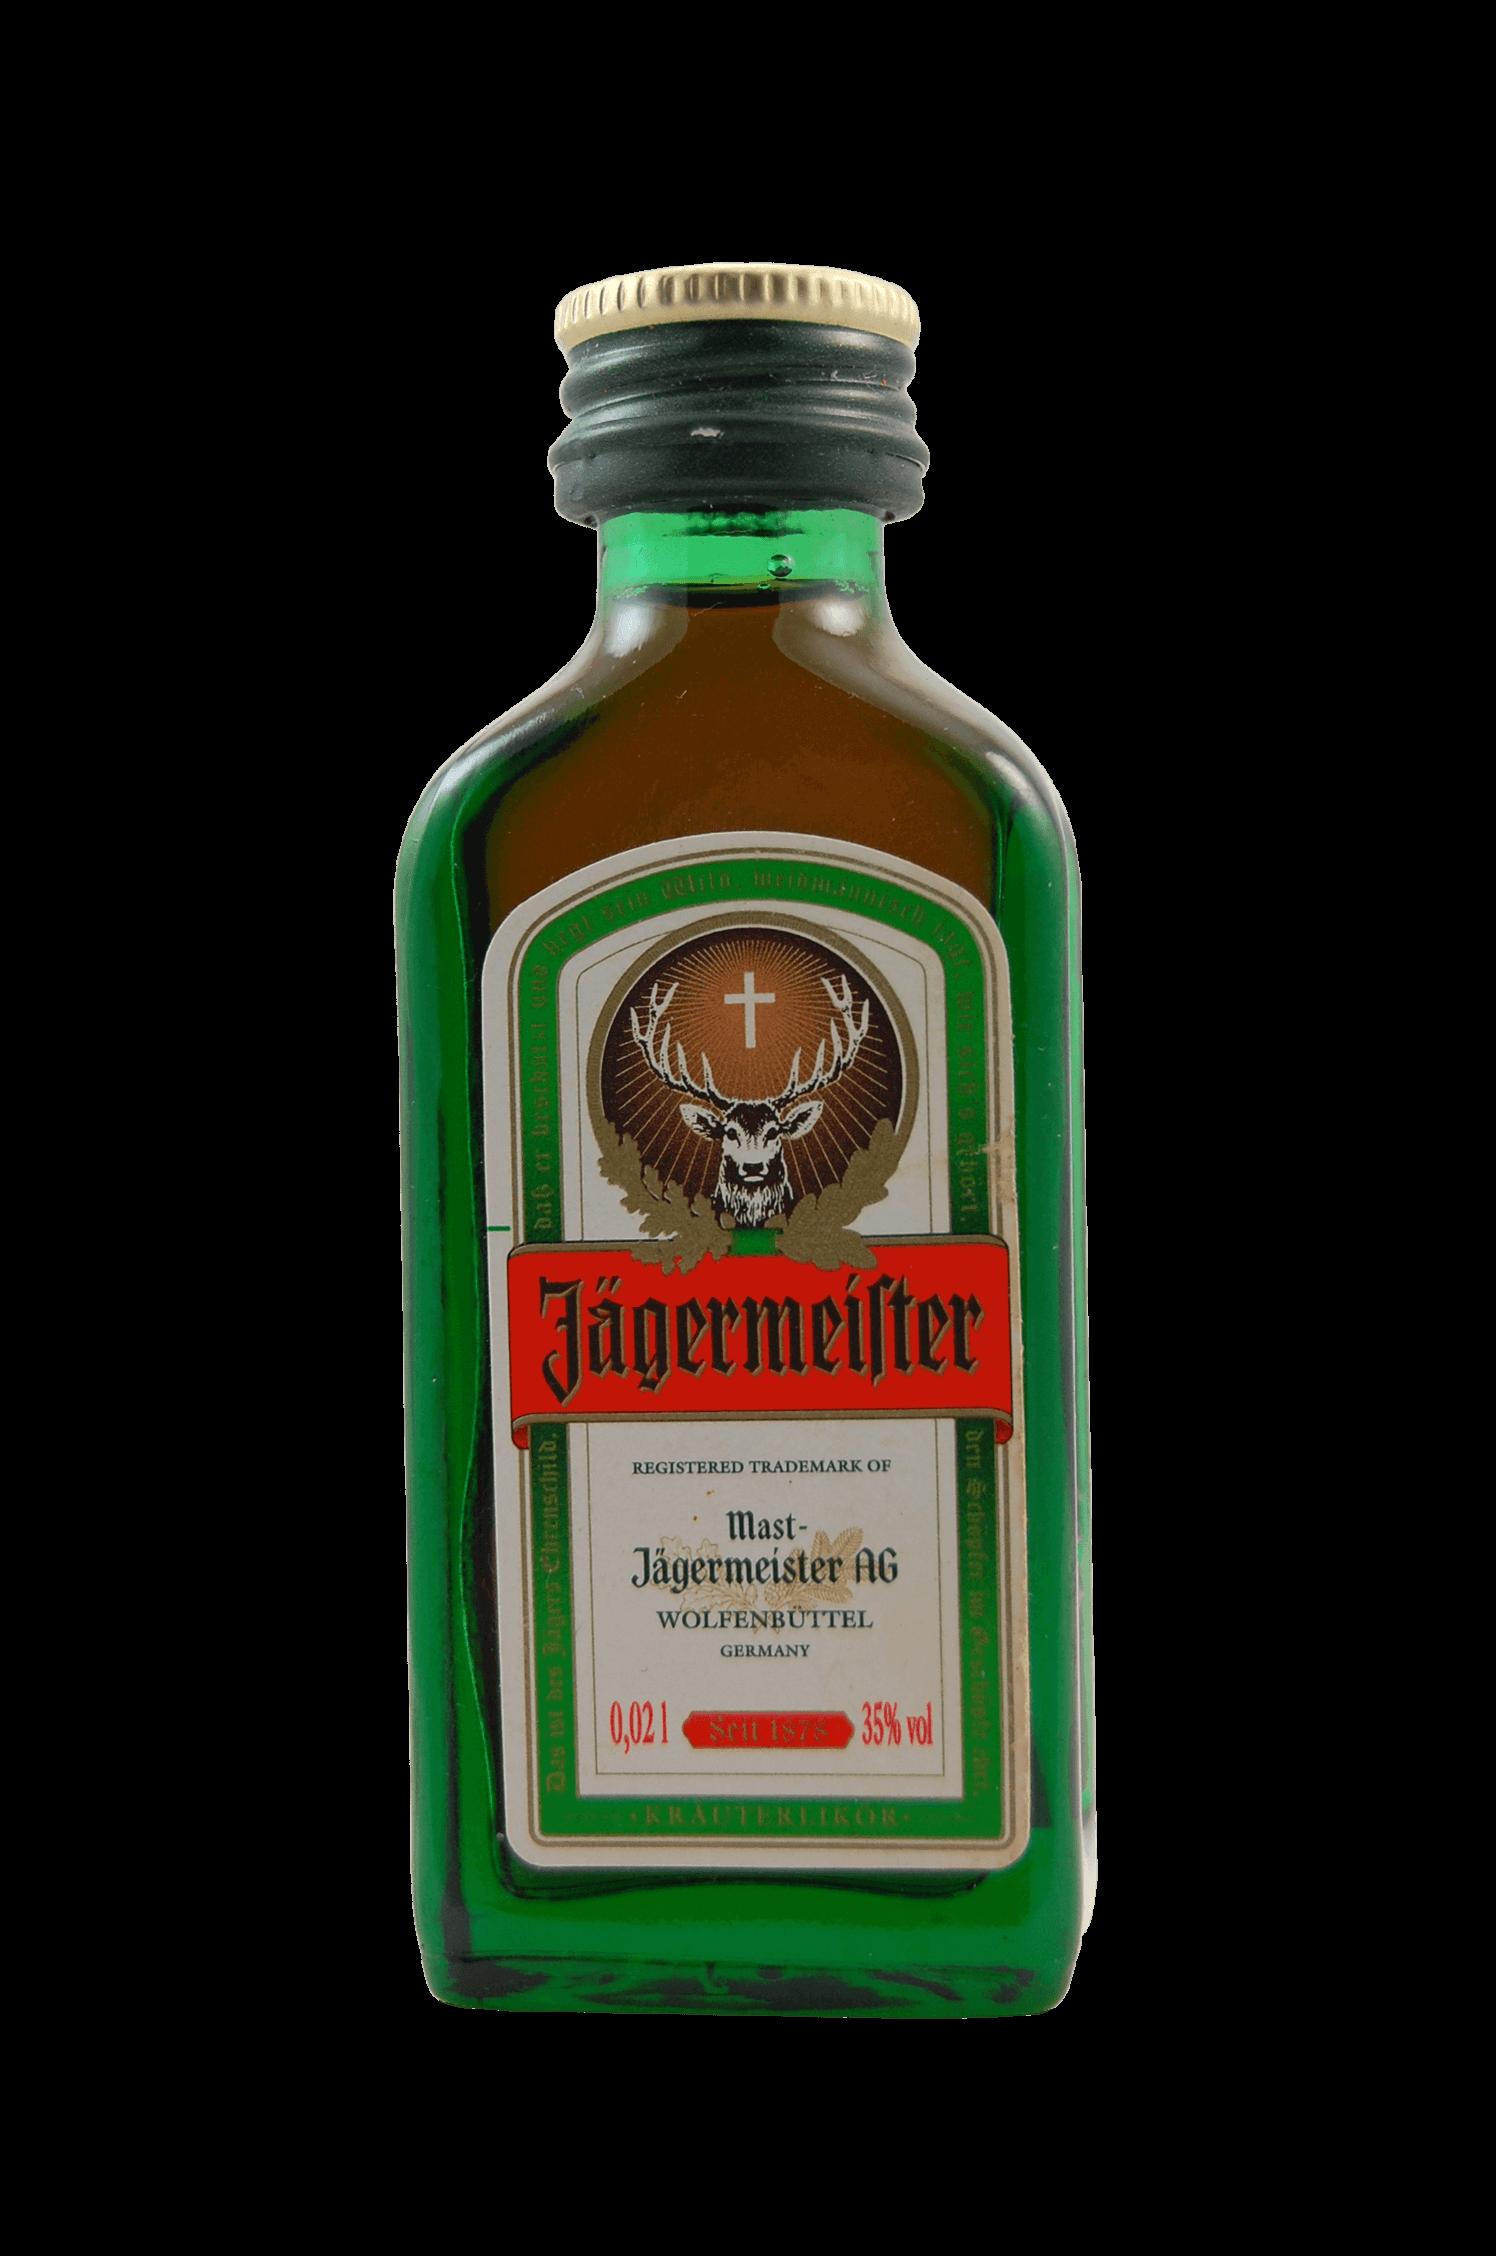 Jägermeifter Wolfenbüttel